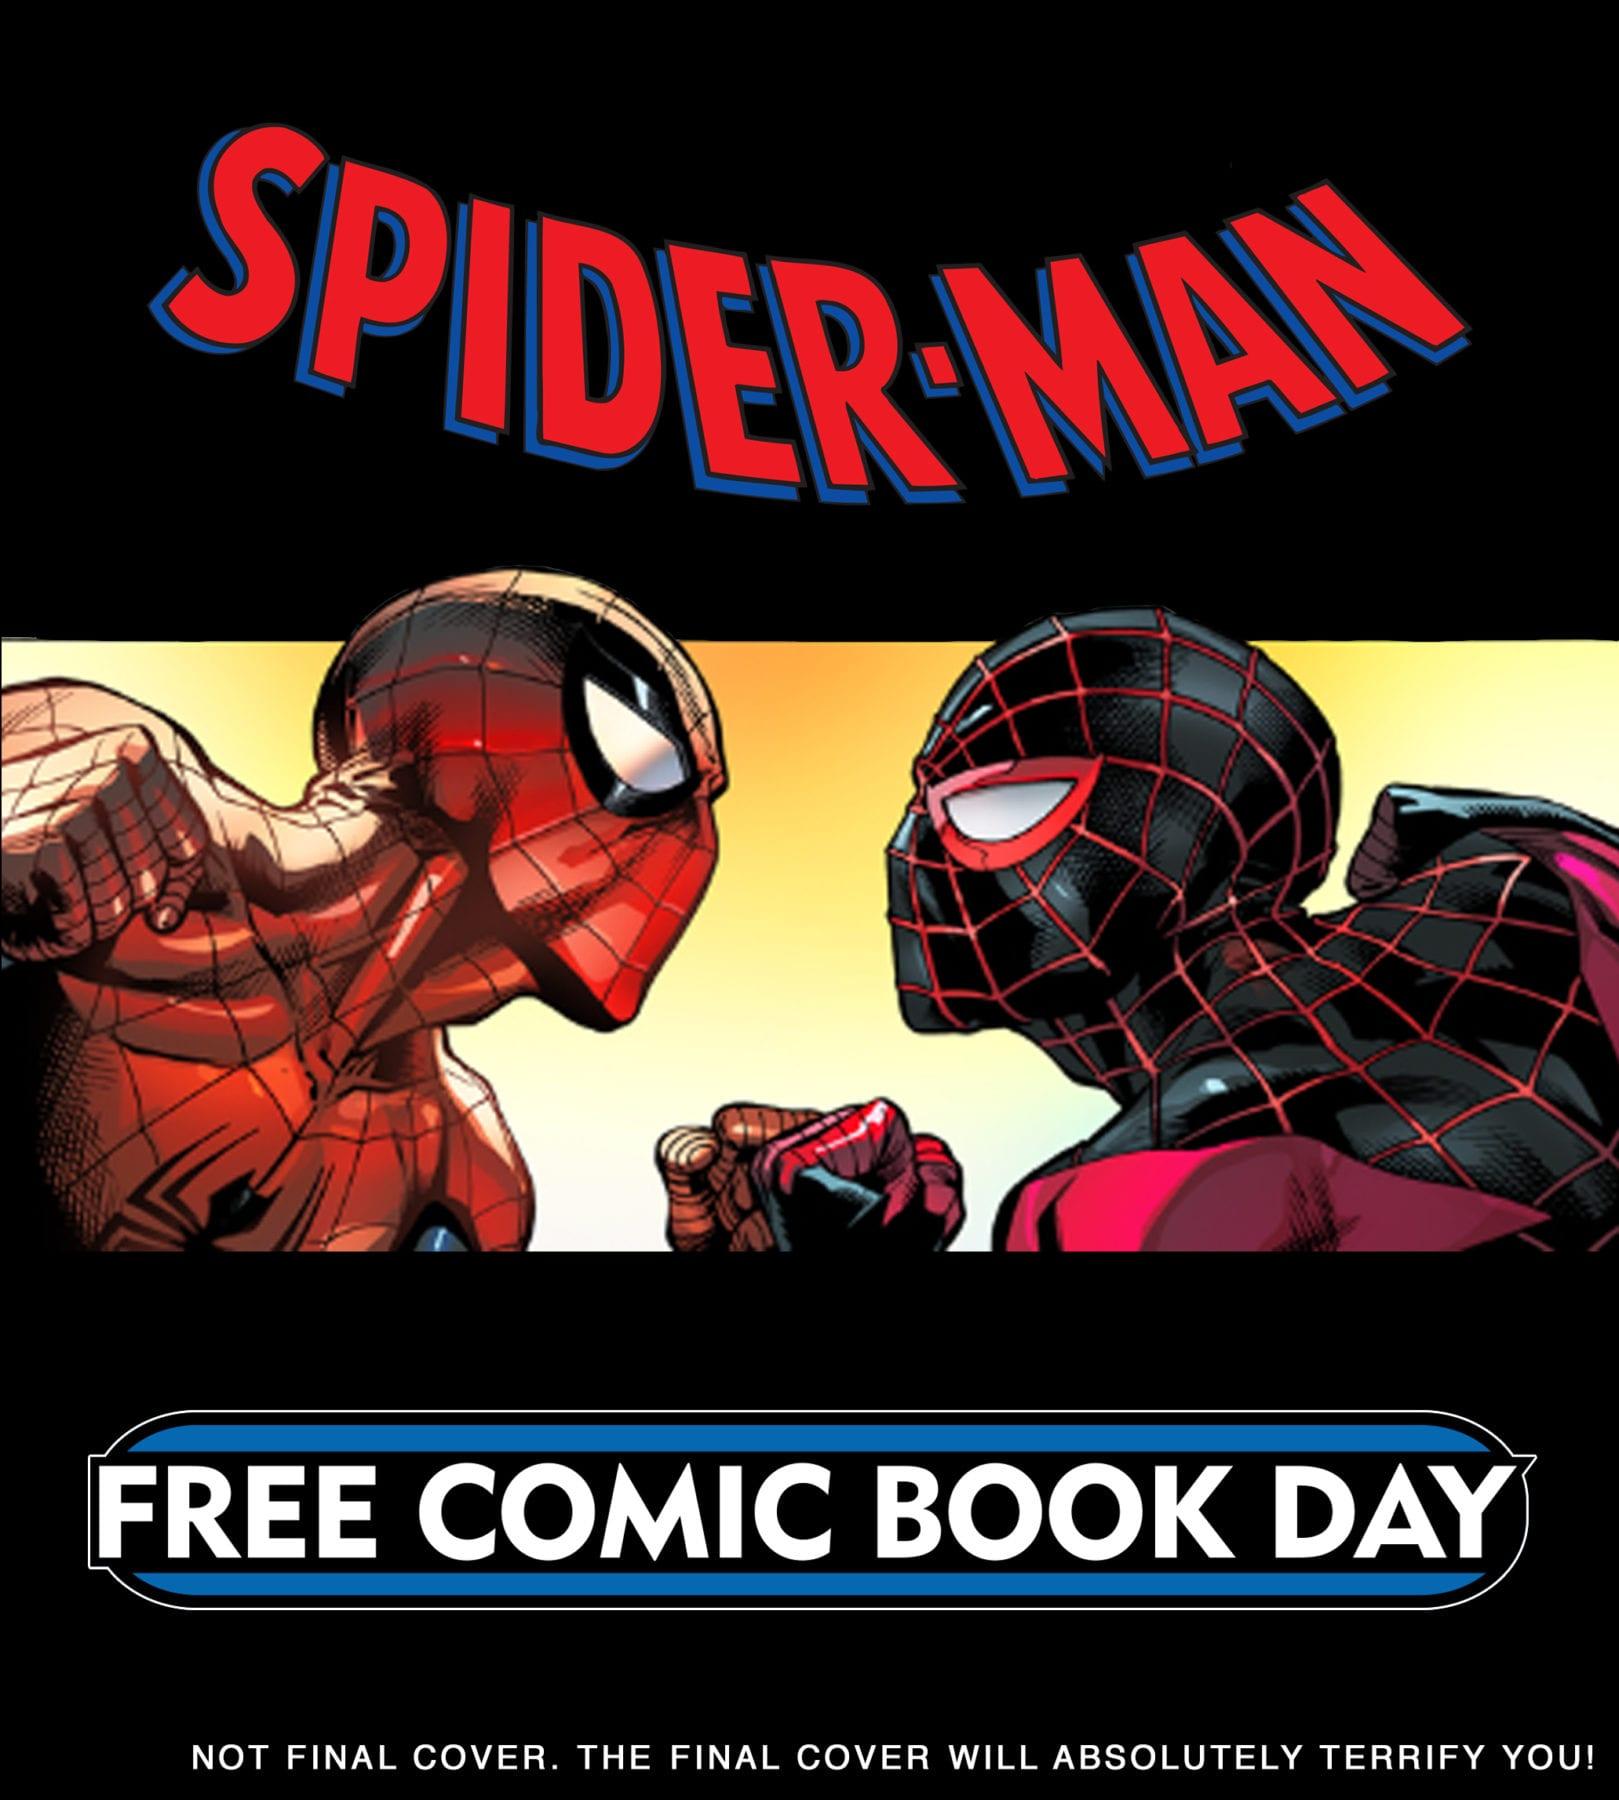 Free Comic Book Day Amazing Spider Man: Marvel Announces Spider-Man/Venom #1 For Free Comic Book